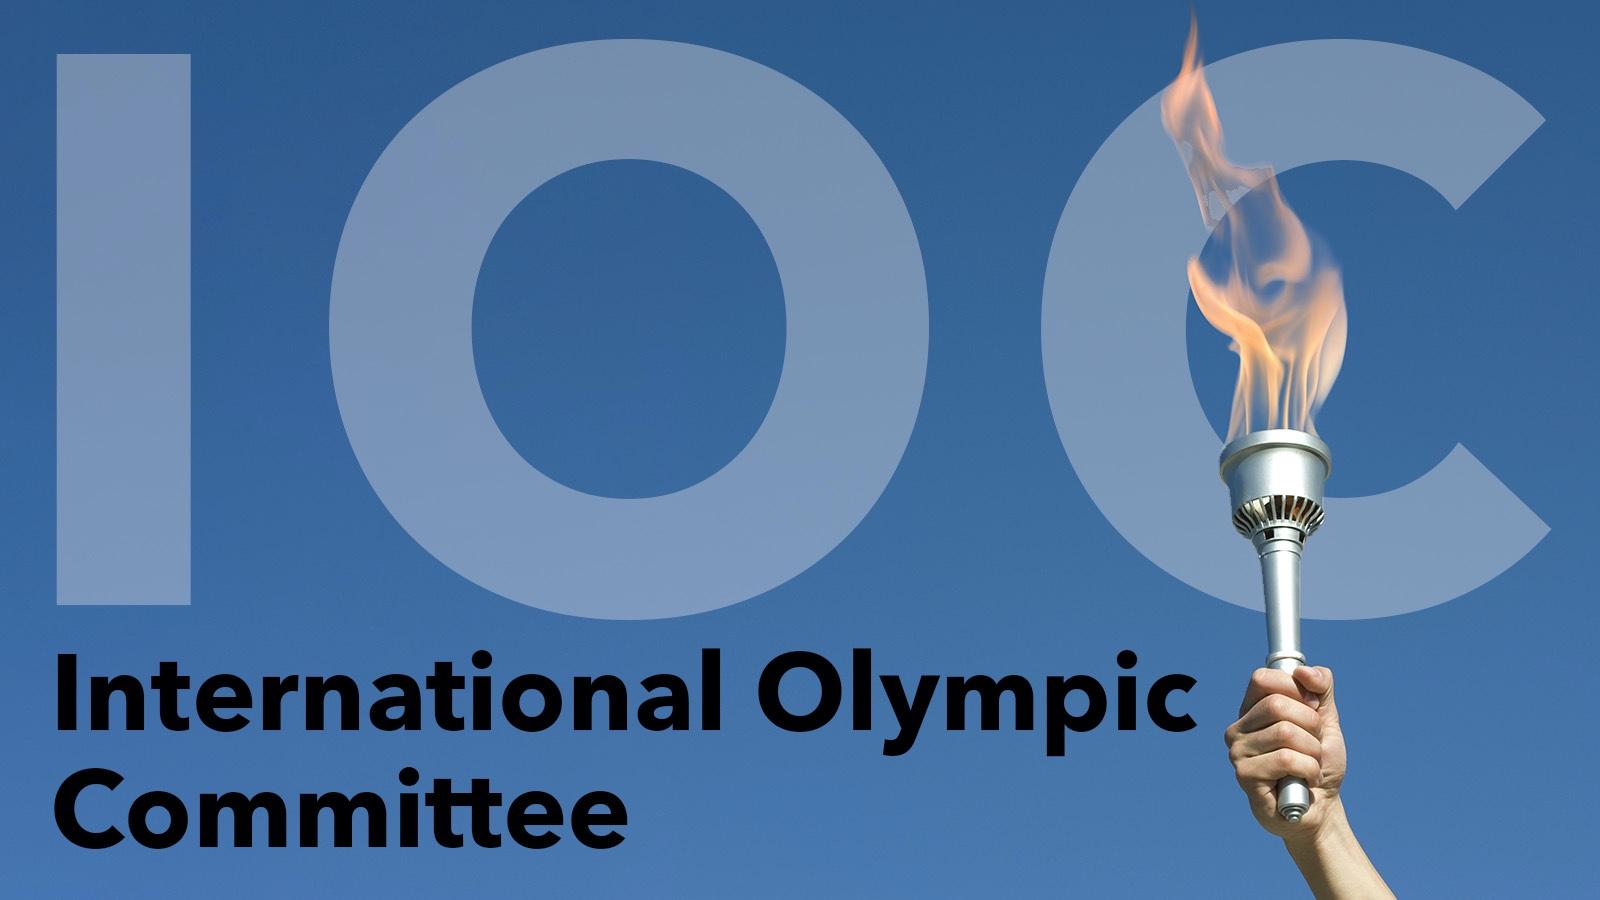 IOC International Olympic Committee acronym